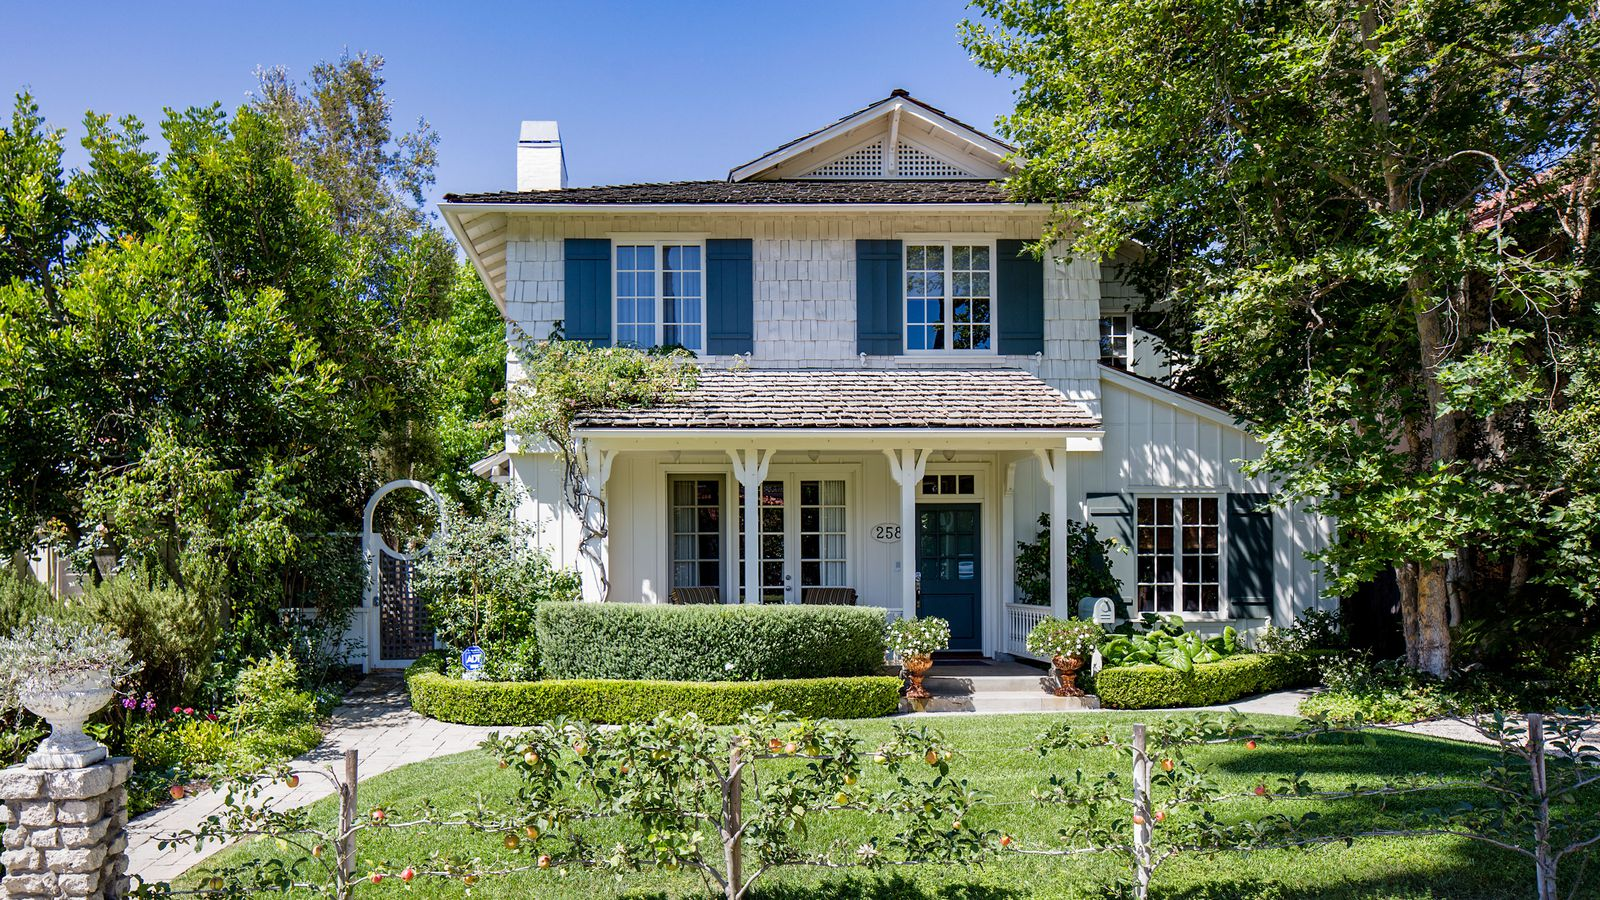 Santa monica home with heavenly backyard asks for House sitting santa monica